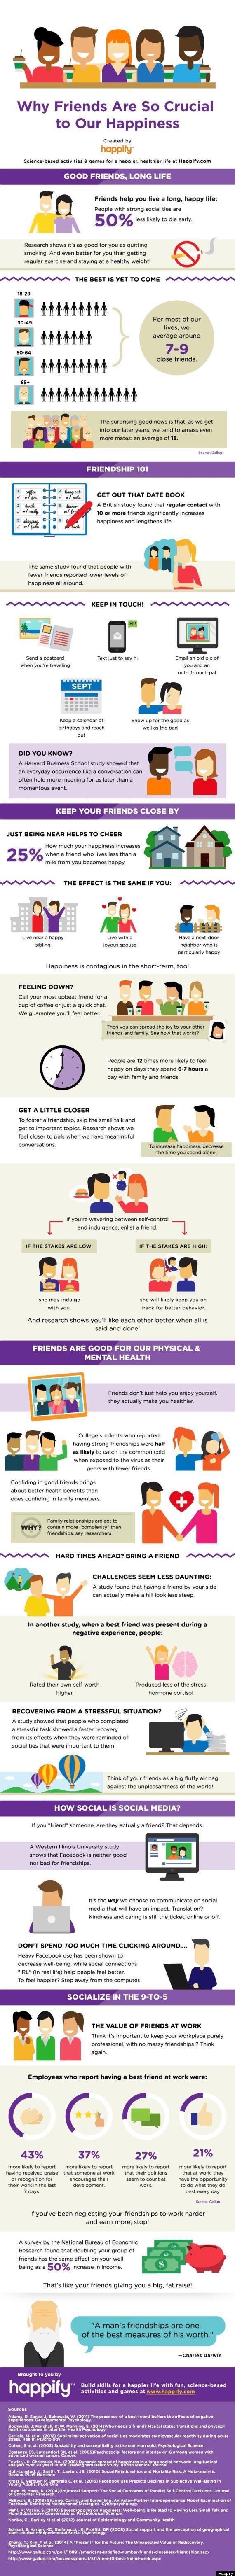 happify-friendship